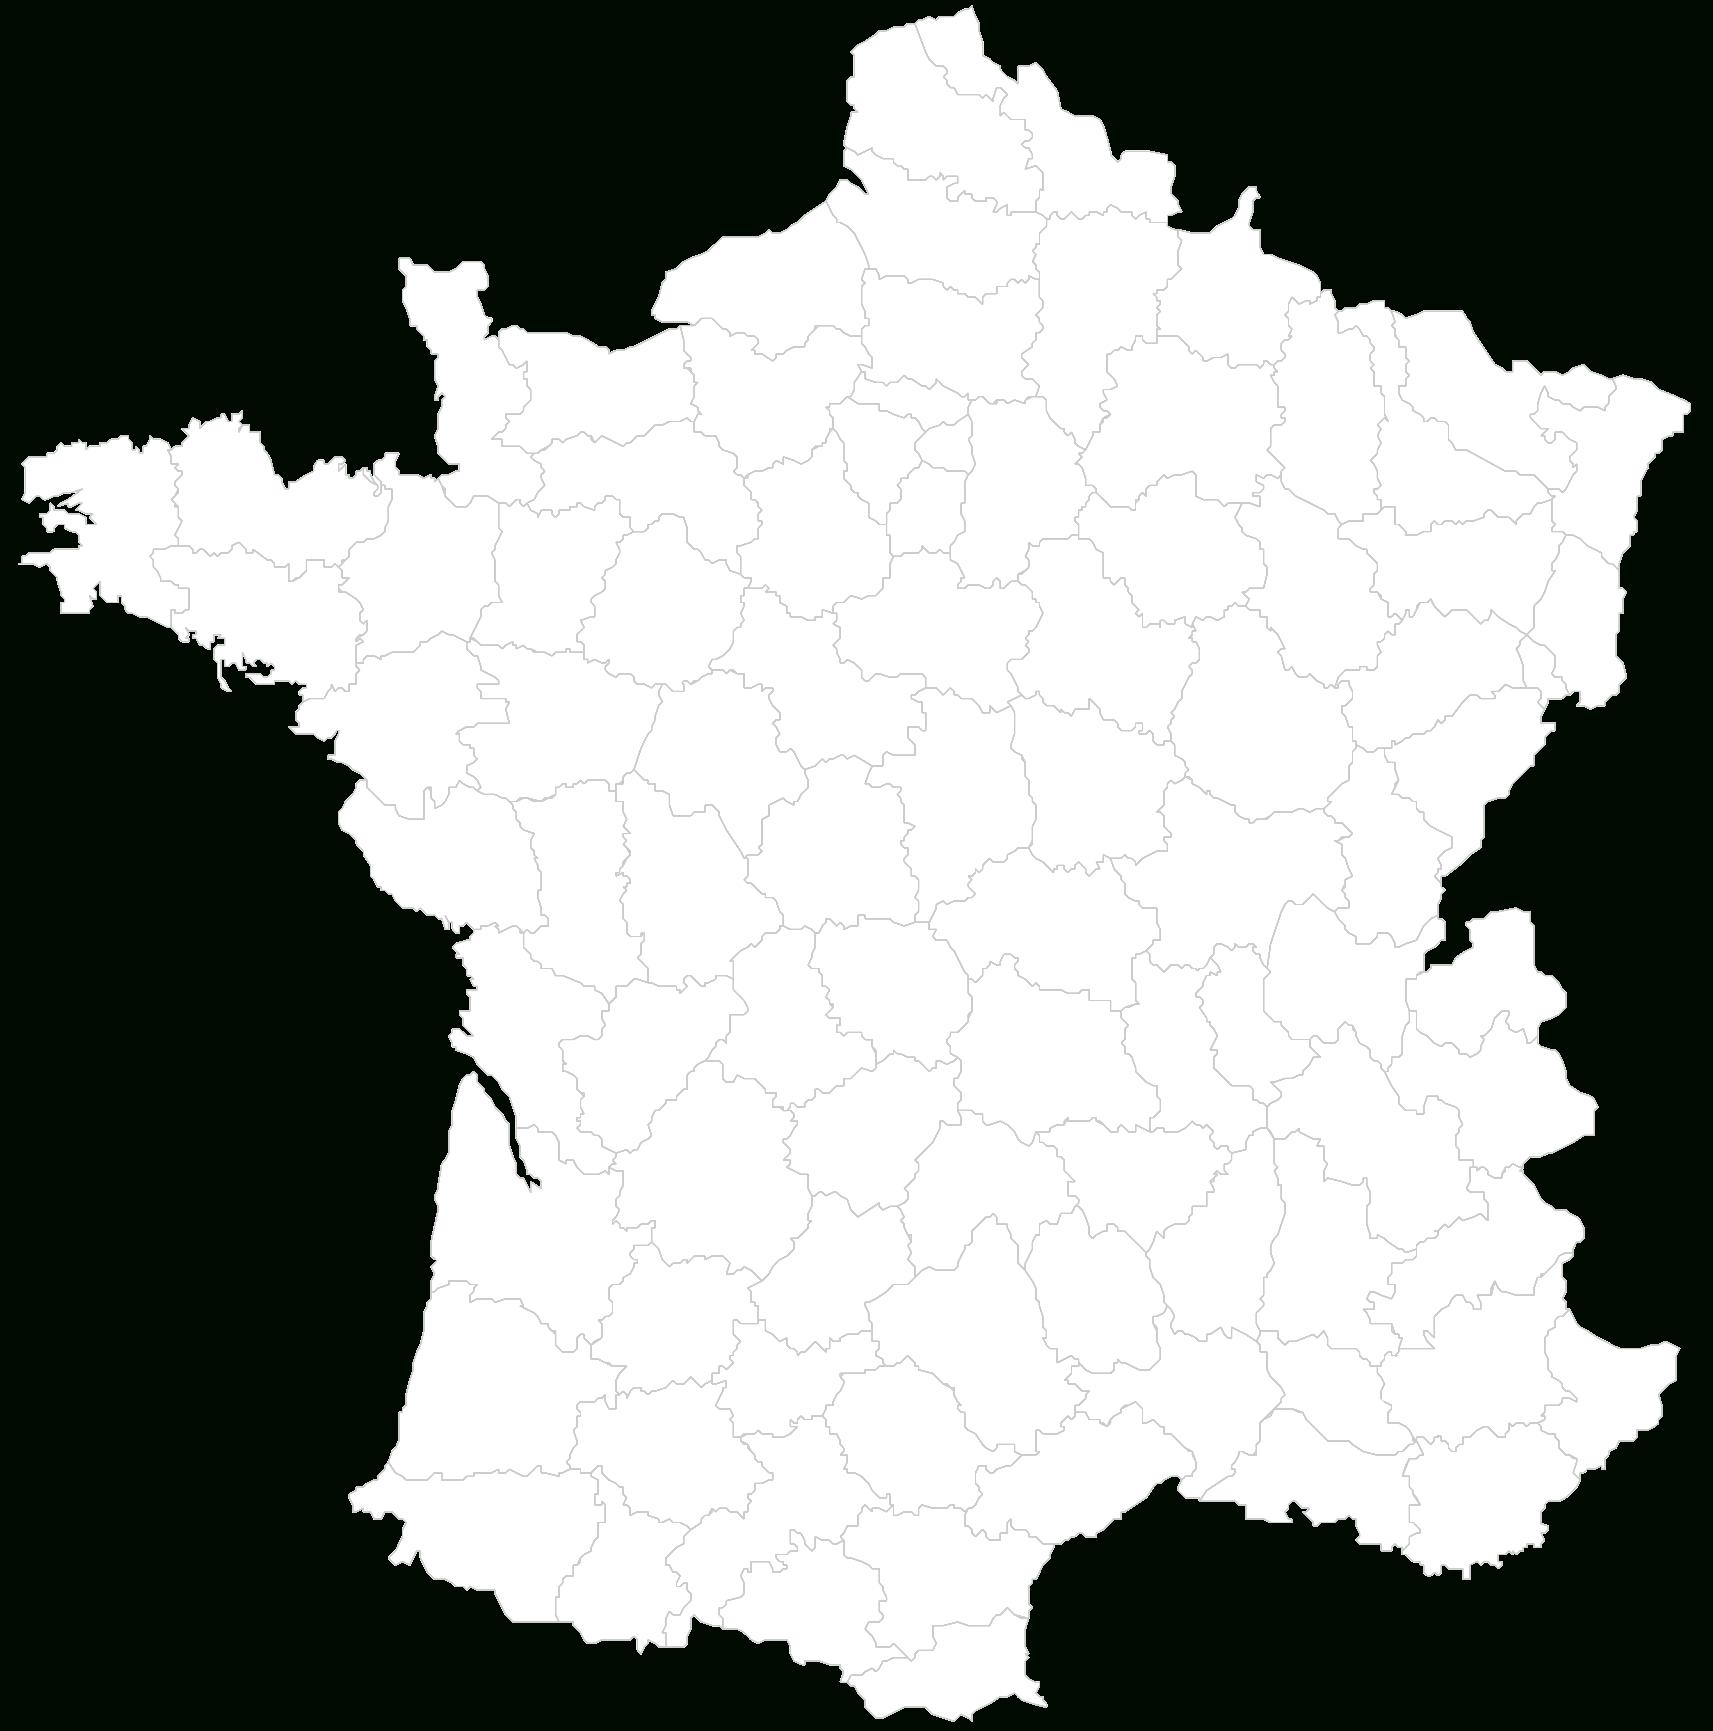 Fond De Carte De France encequiconcerne Fond De Carte France Vierge